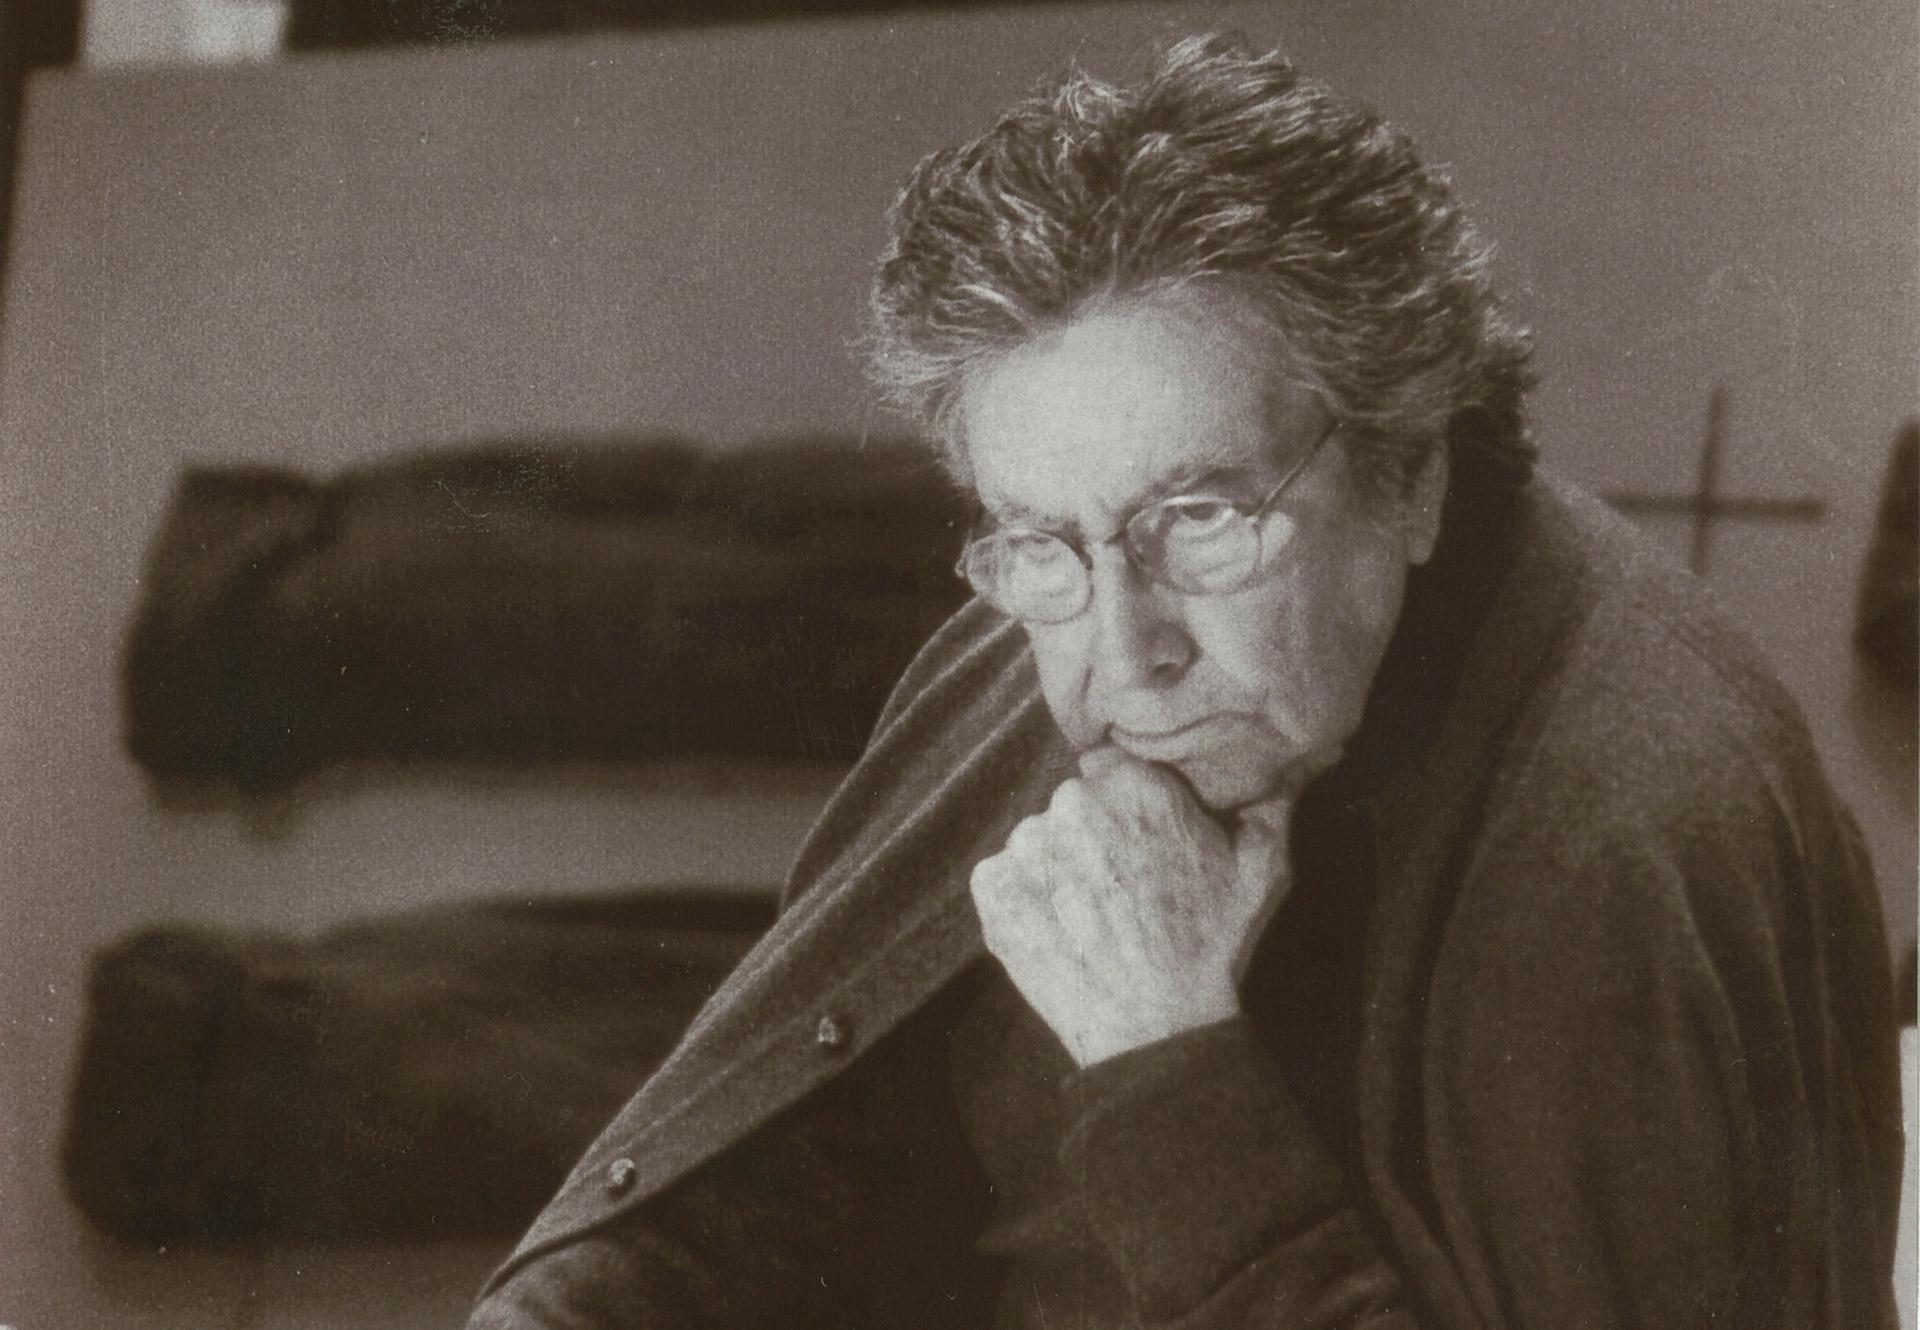 Antoni Tàpies | Artistas | Guggenheim Bilbao Museoa